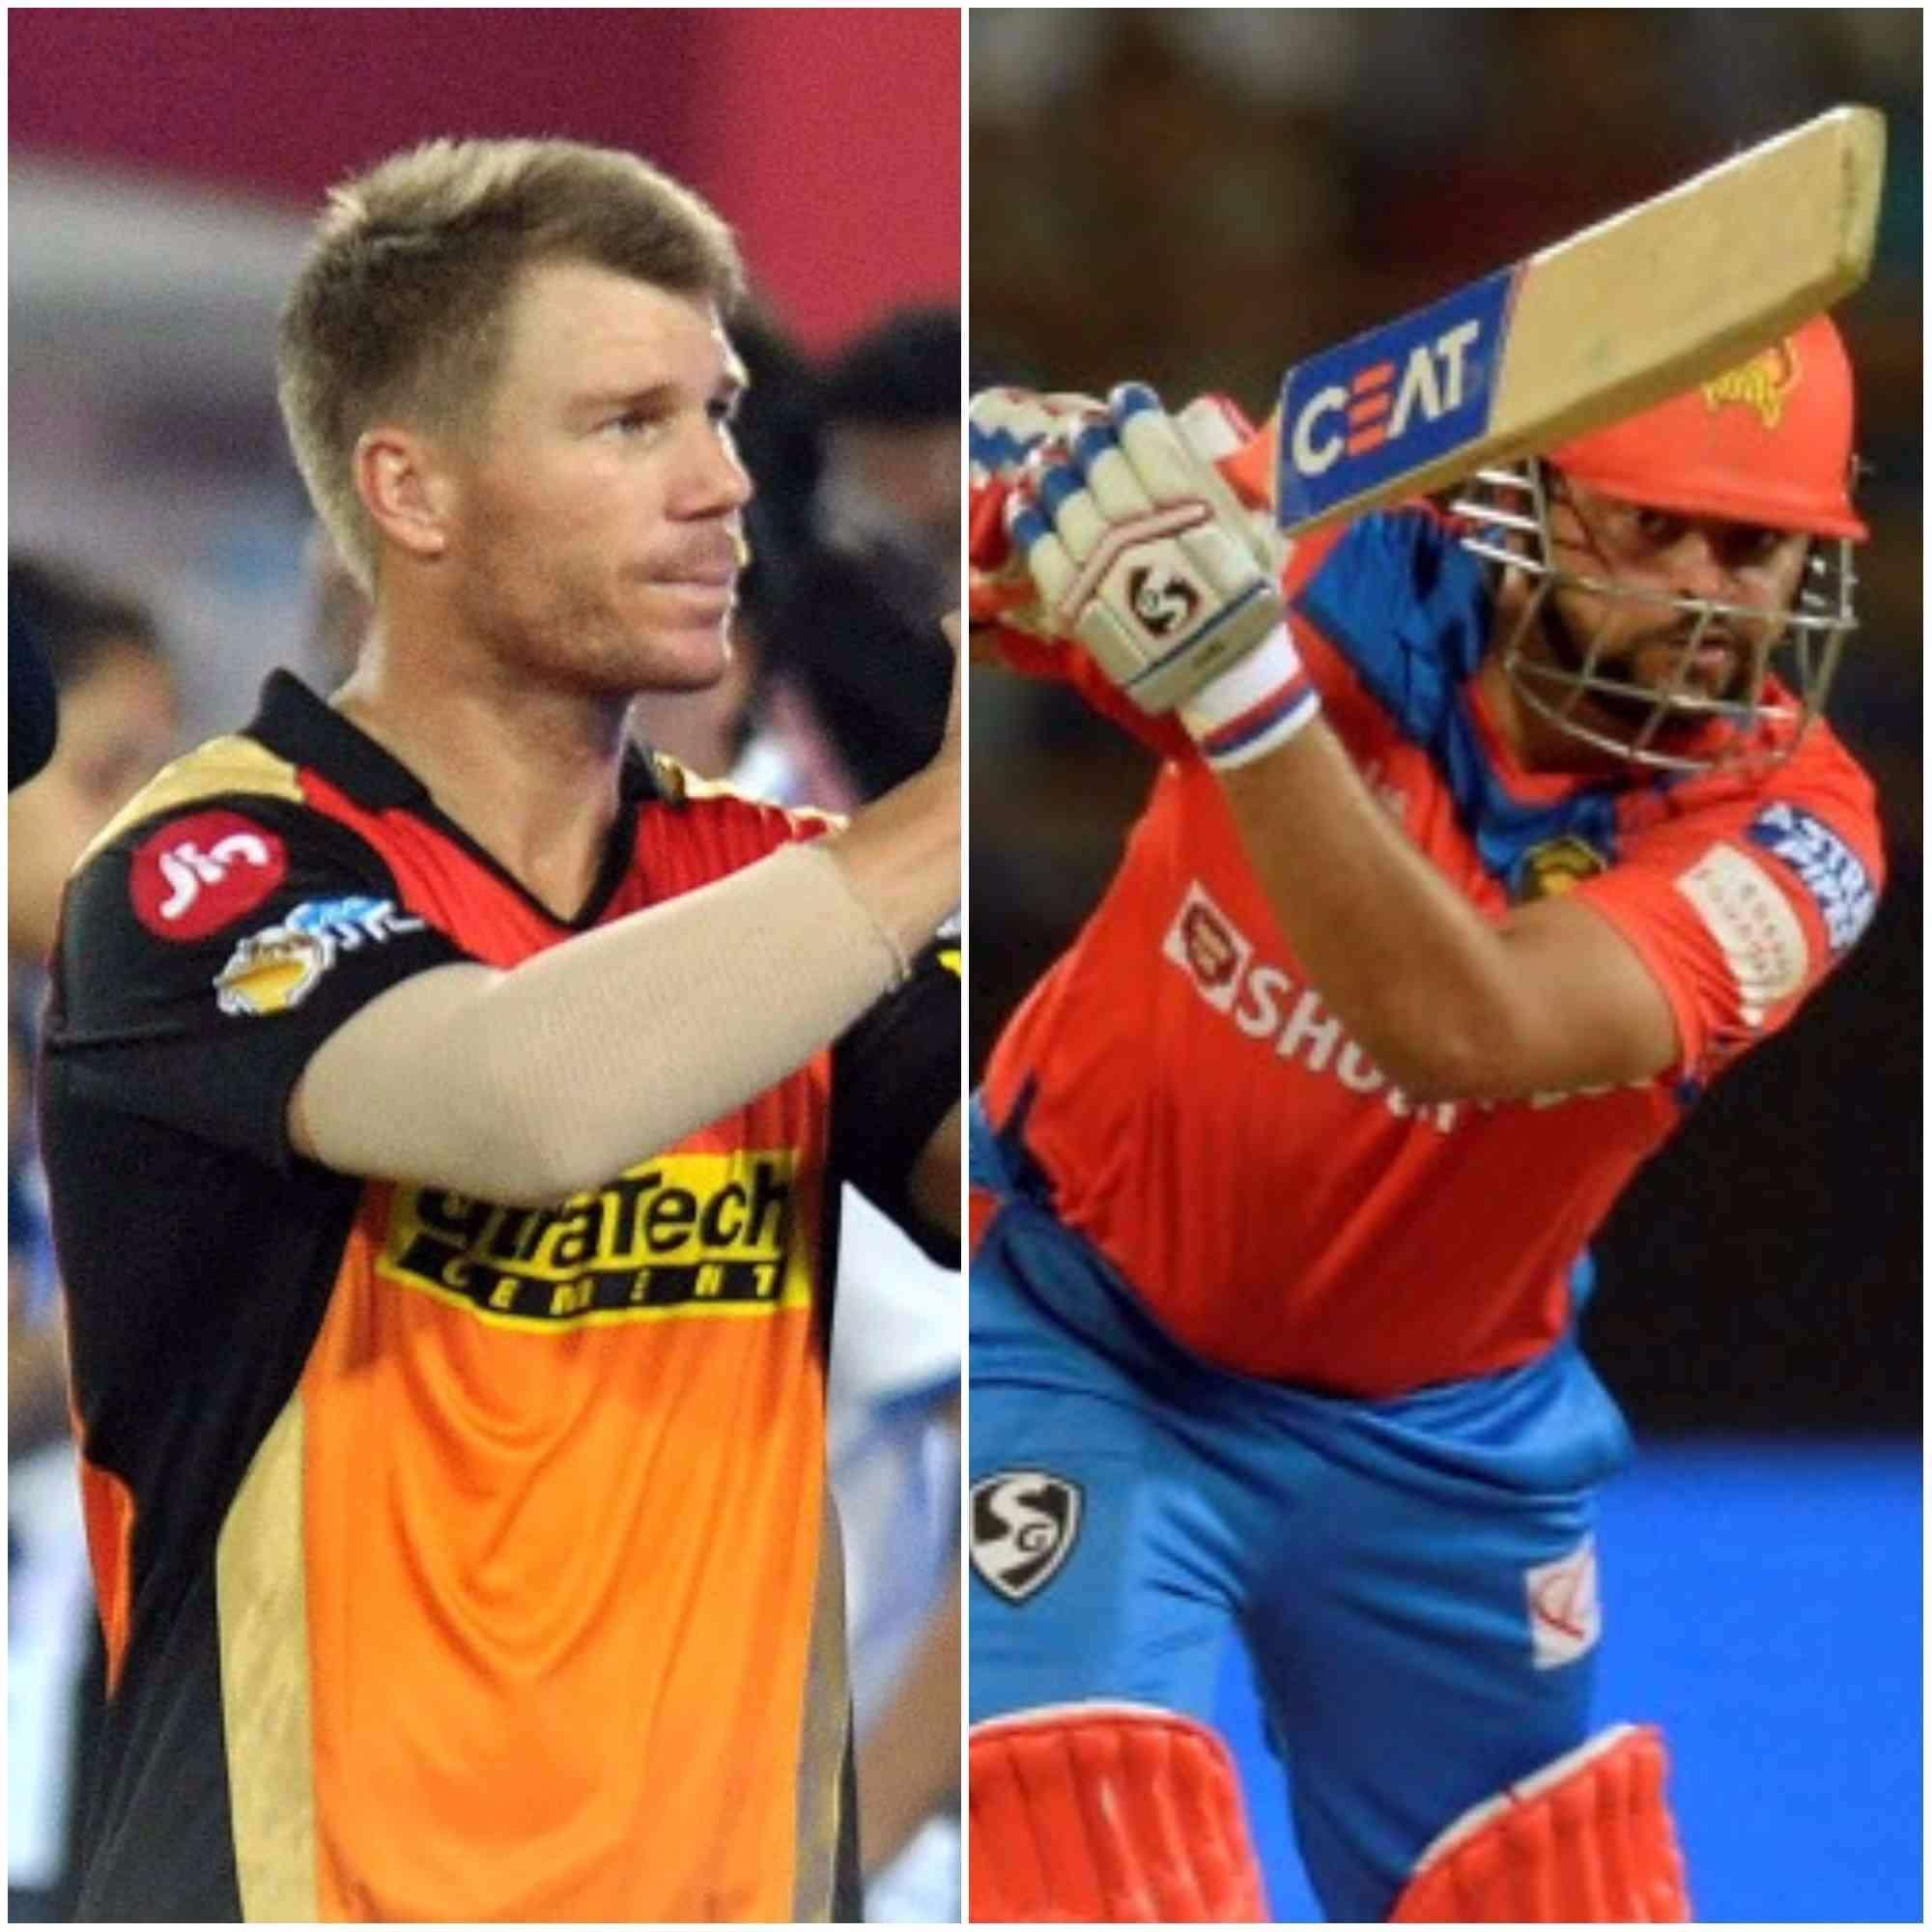 Sunrisers Hyderabad Song Download 2017: Gujarat Lions: IPL 2017 Live Score SRH Vs GL: Sunrisers